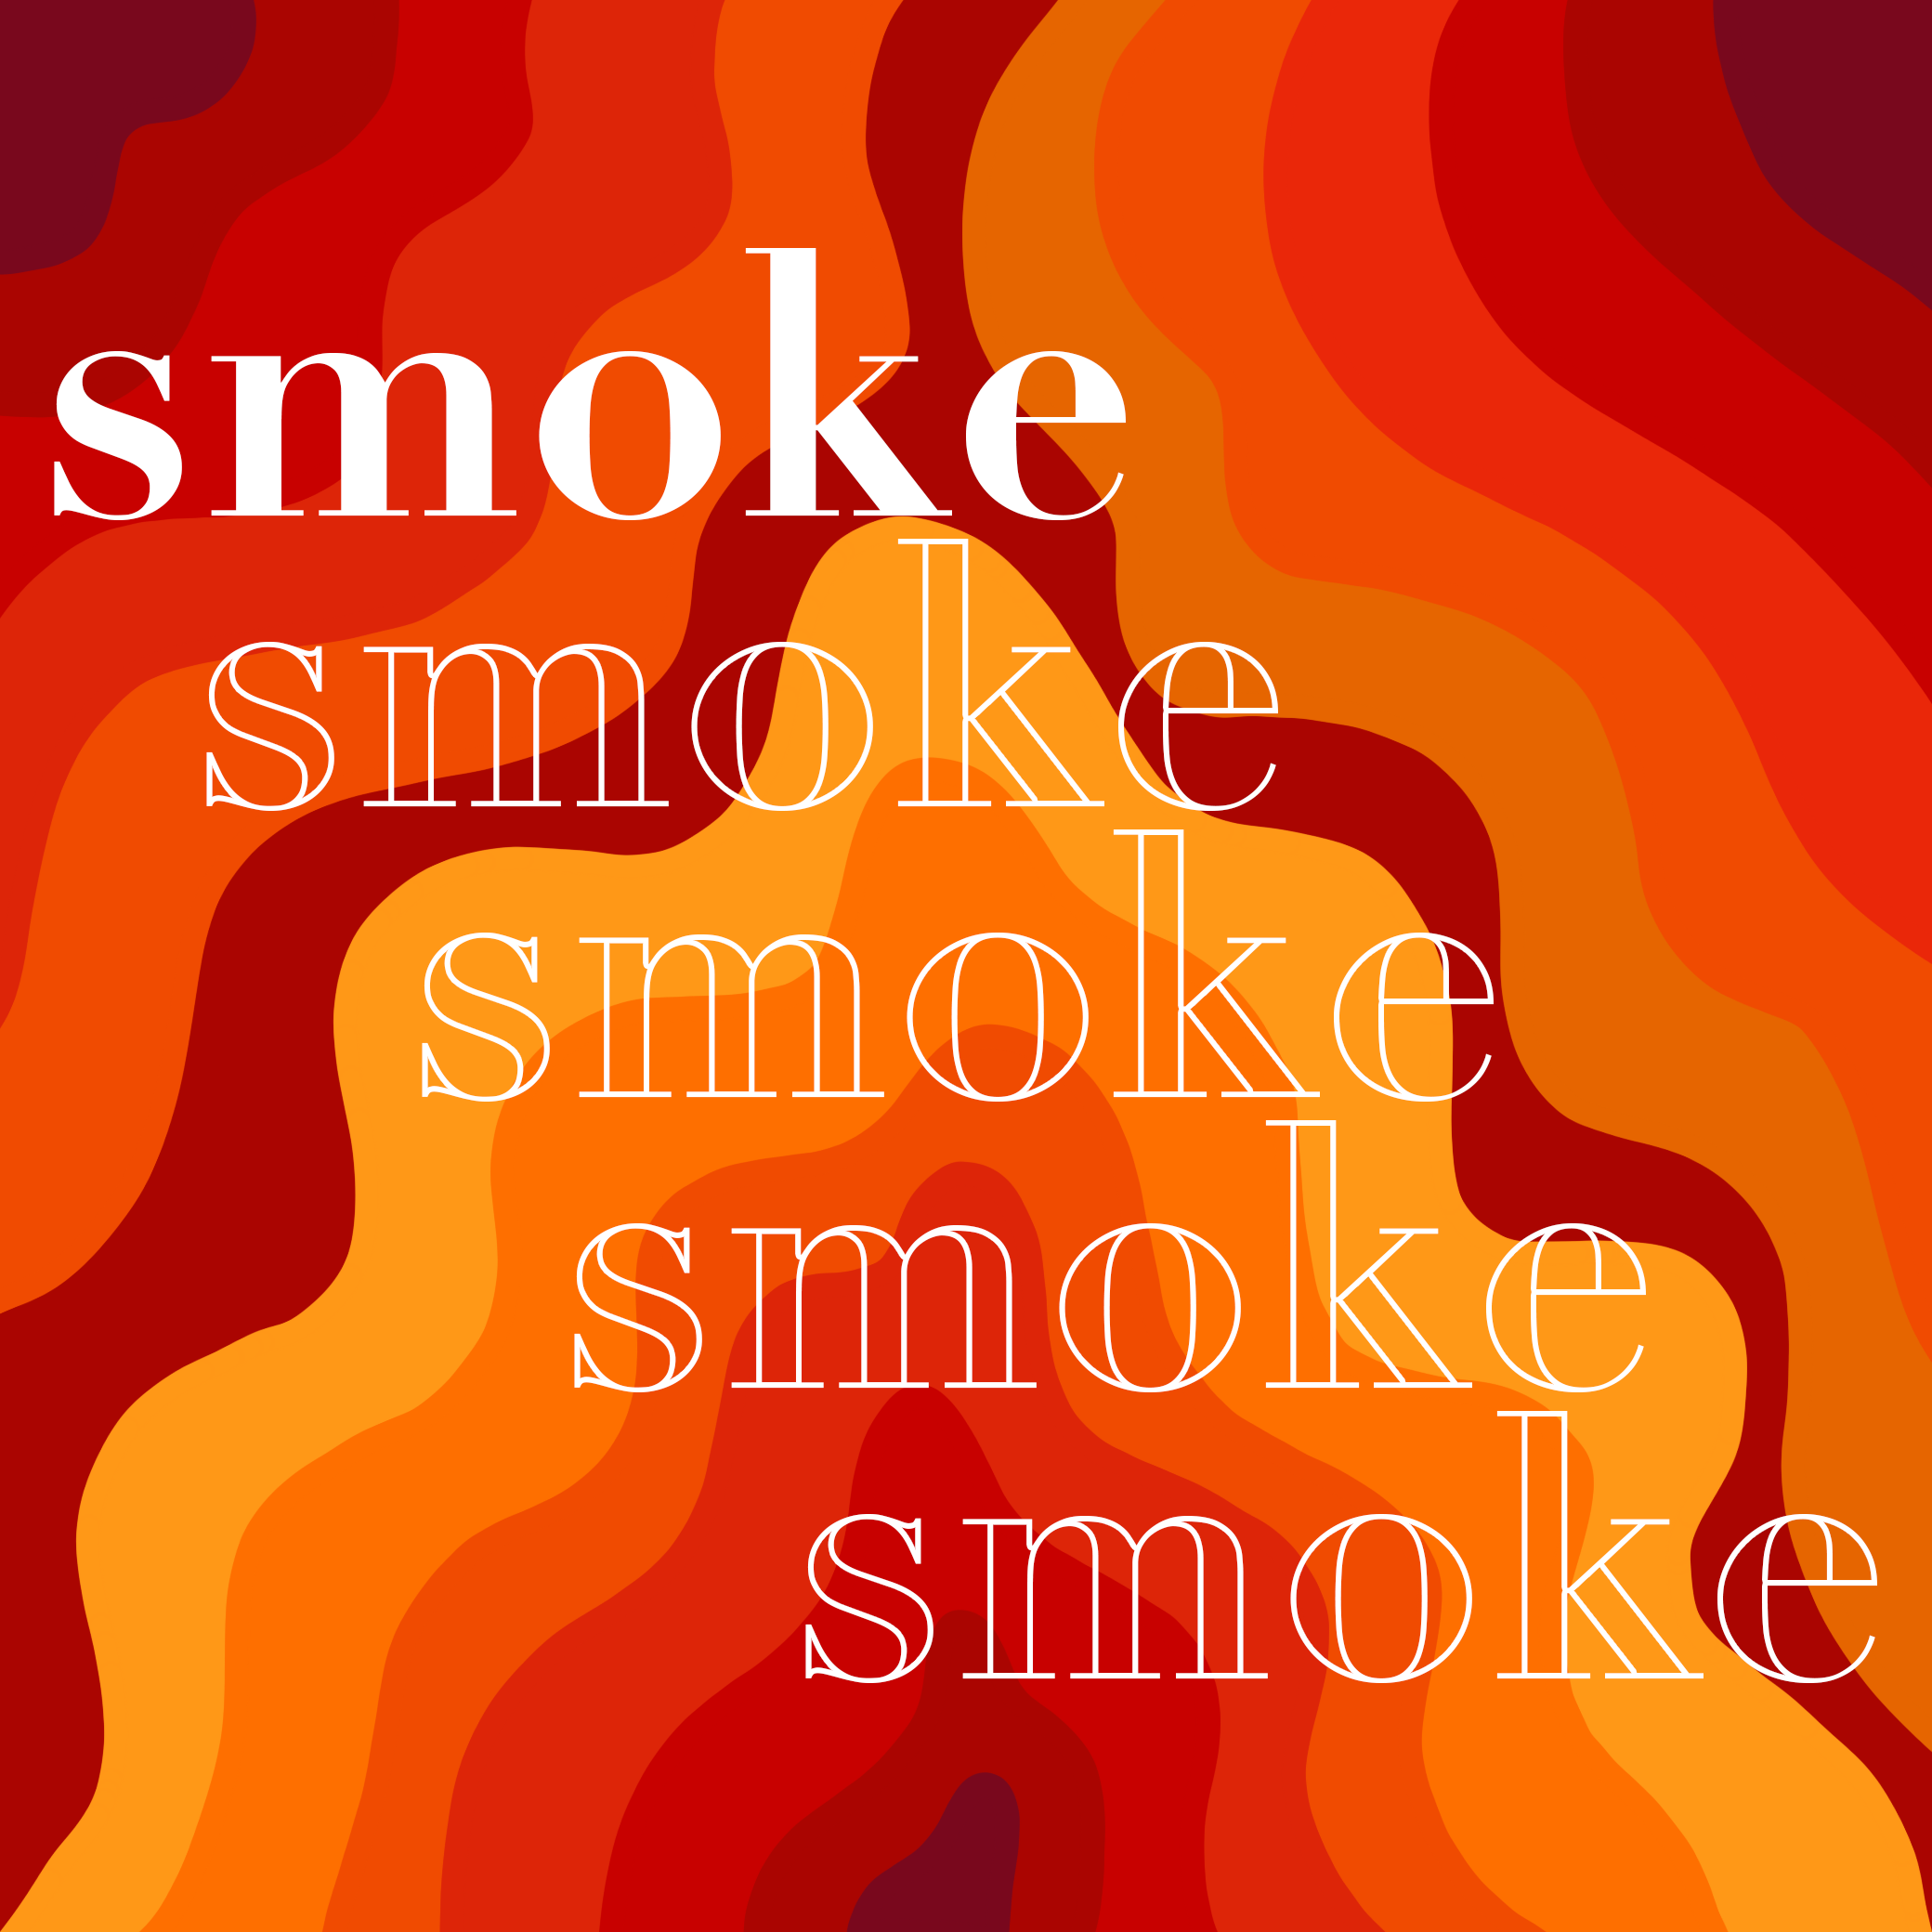 Smoke_Dub_Red.png